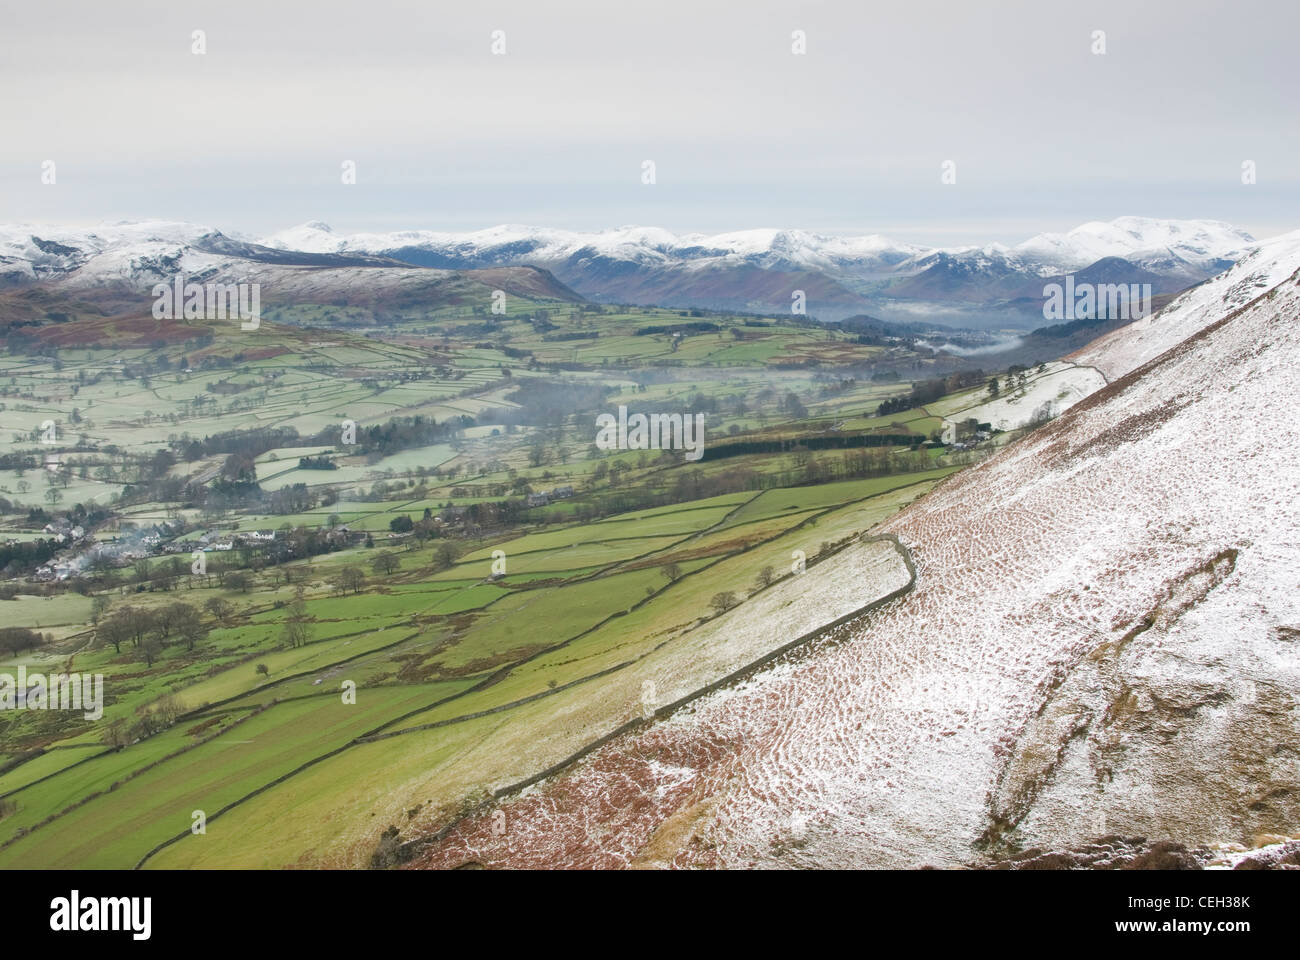 River Glenderamackin Valley from the slopes of Blencathra Stock Photo